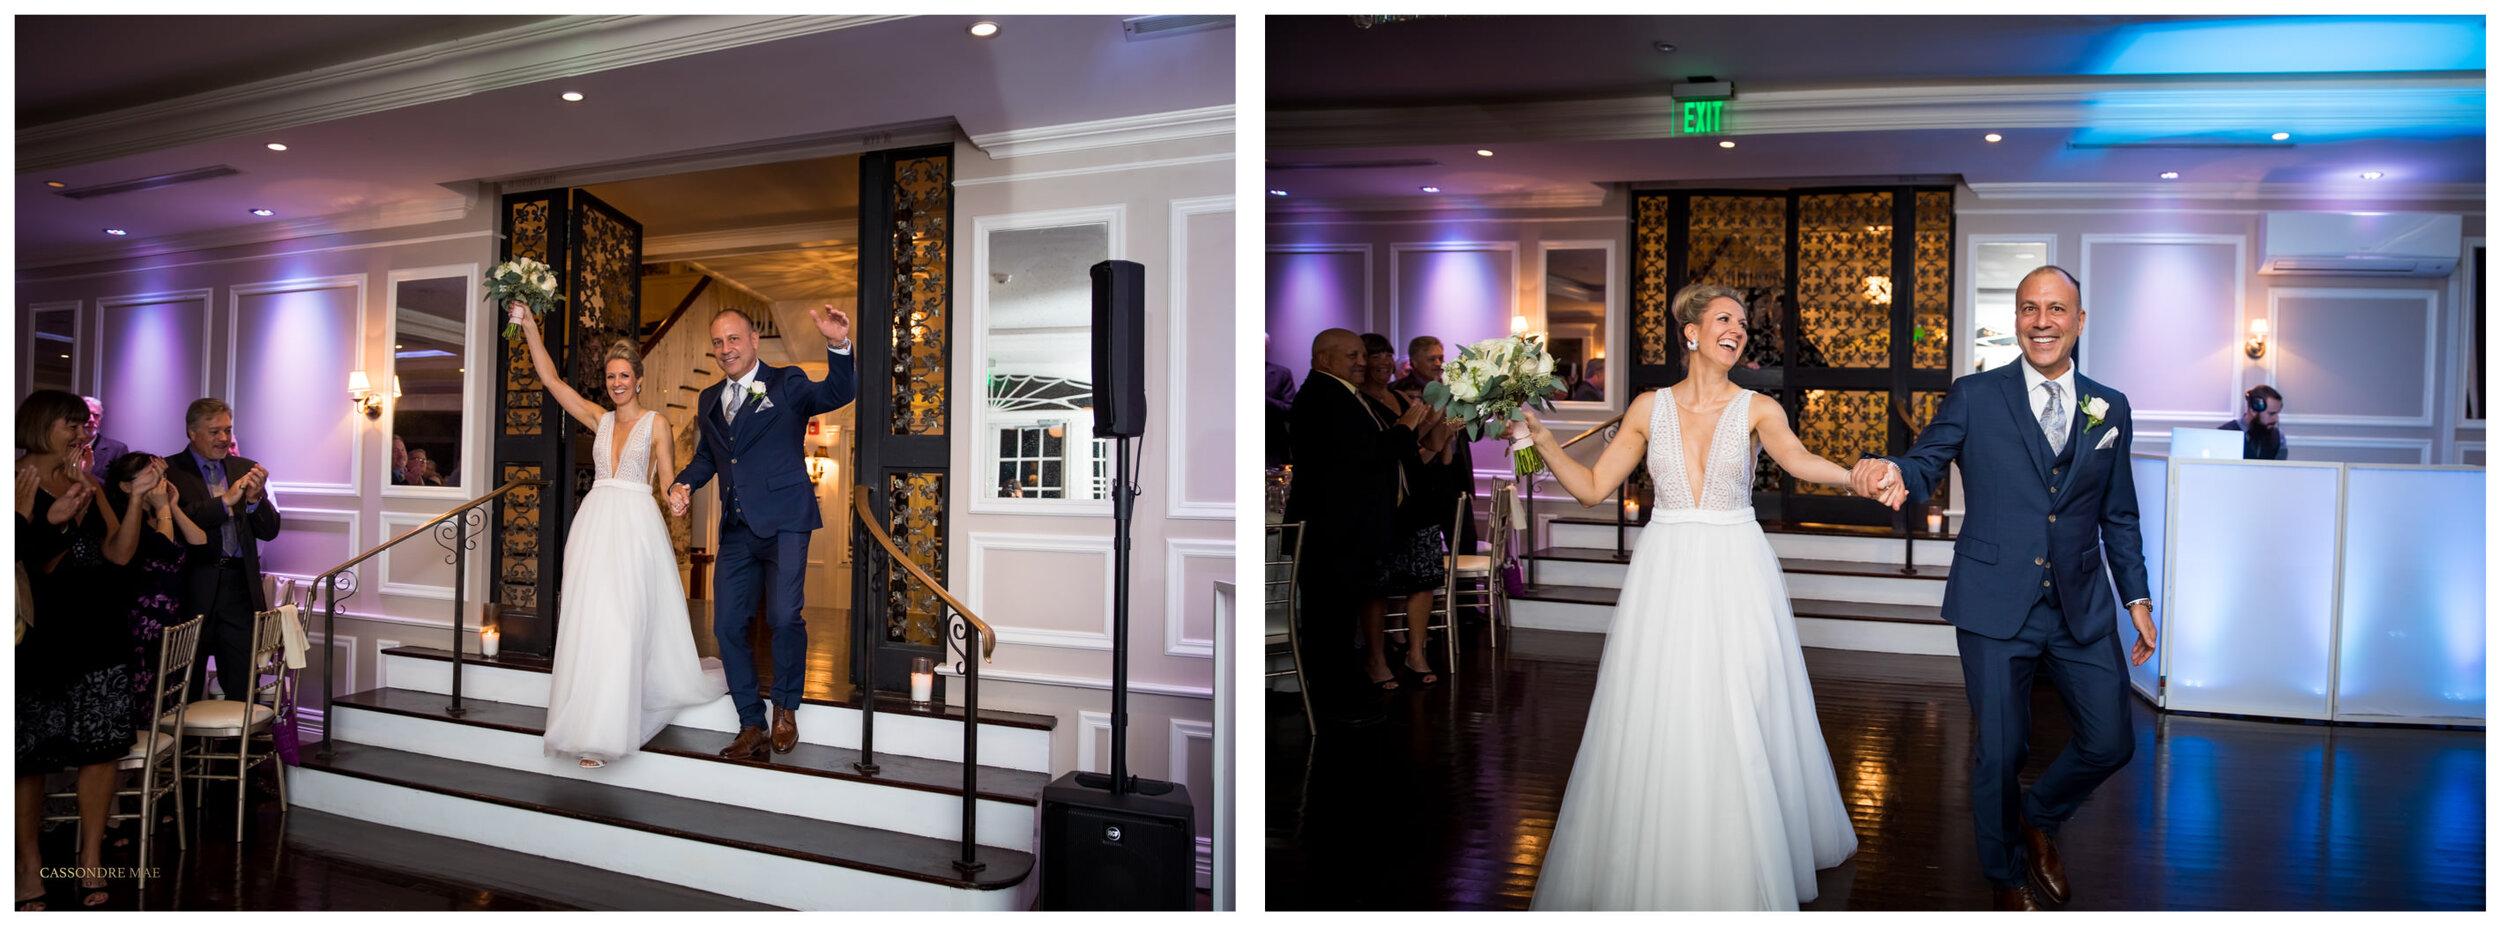 Cassondre Mae Photography Briarcliff Manor Wedding Photographer 16.jpg